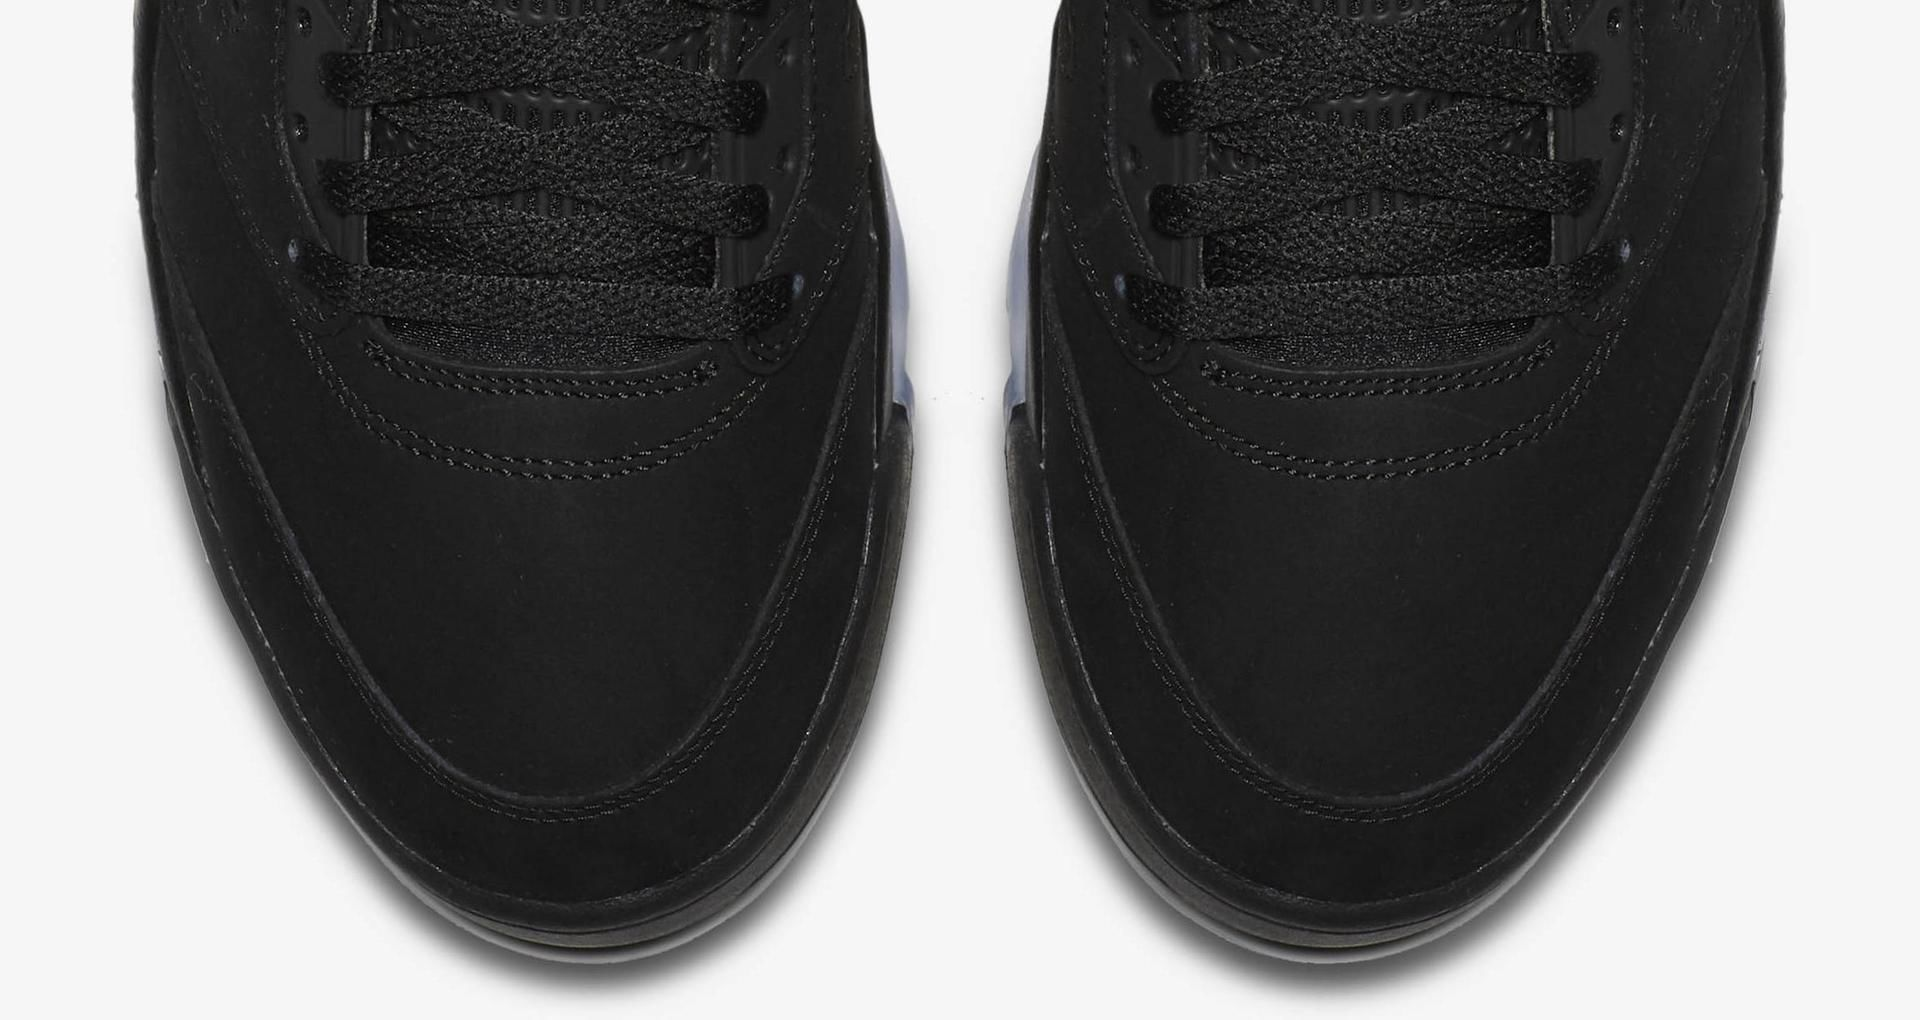 new product c0b18 da2f4 Air Jordan 5 PSG ' Black & Challenge Red' Release Date ...